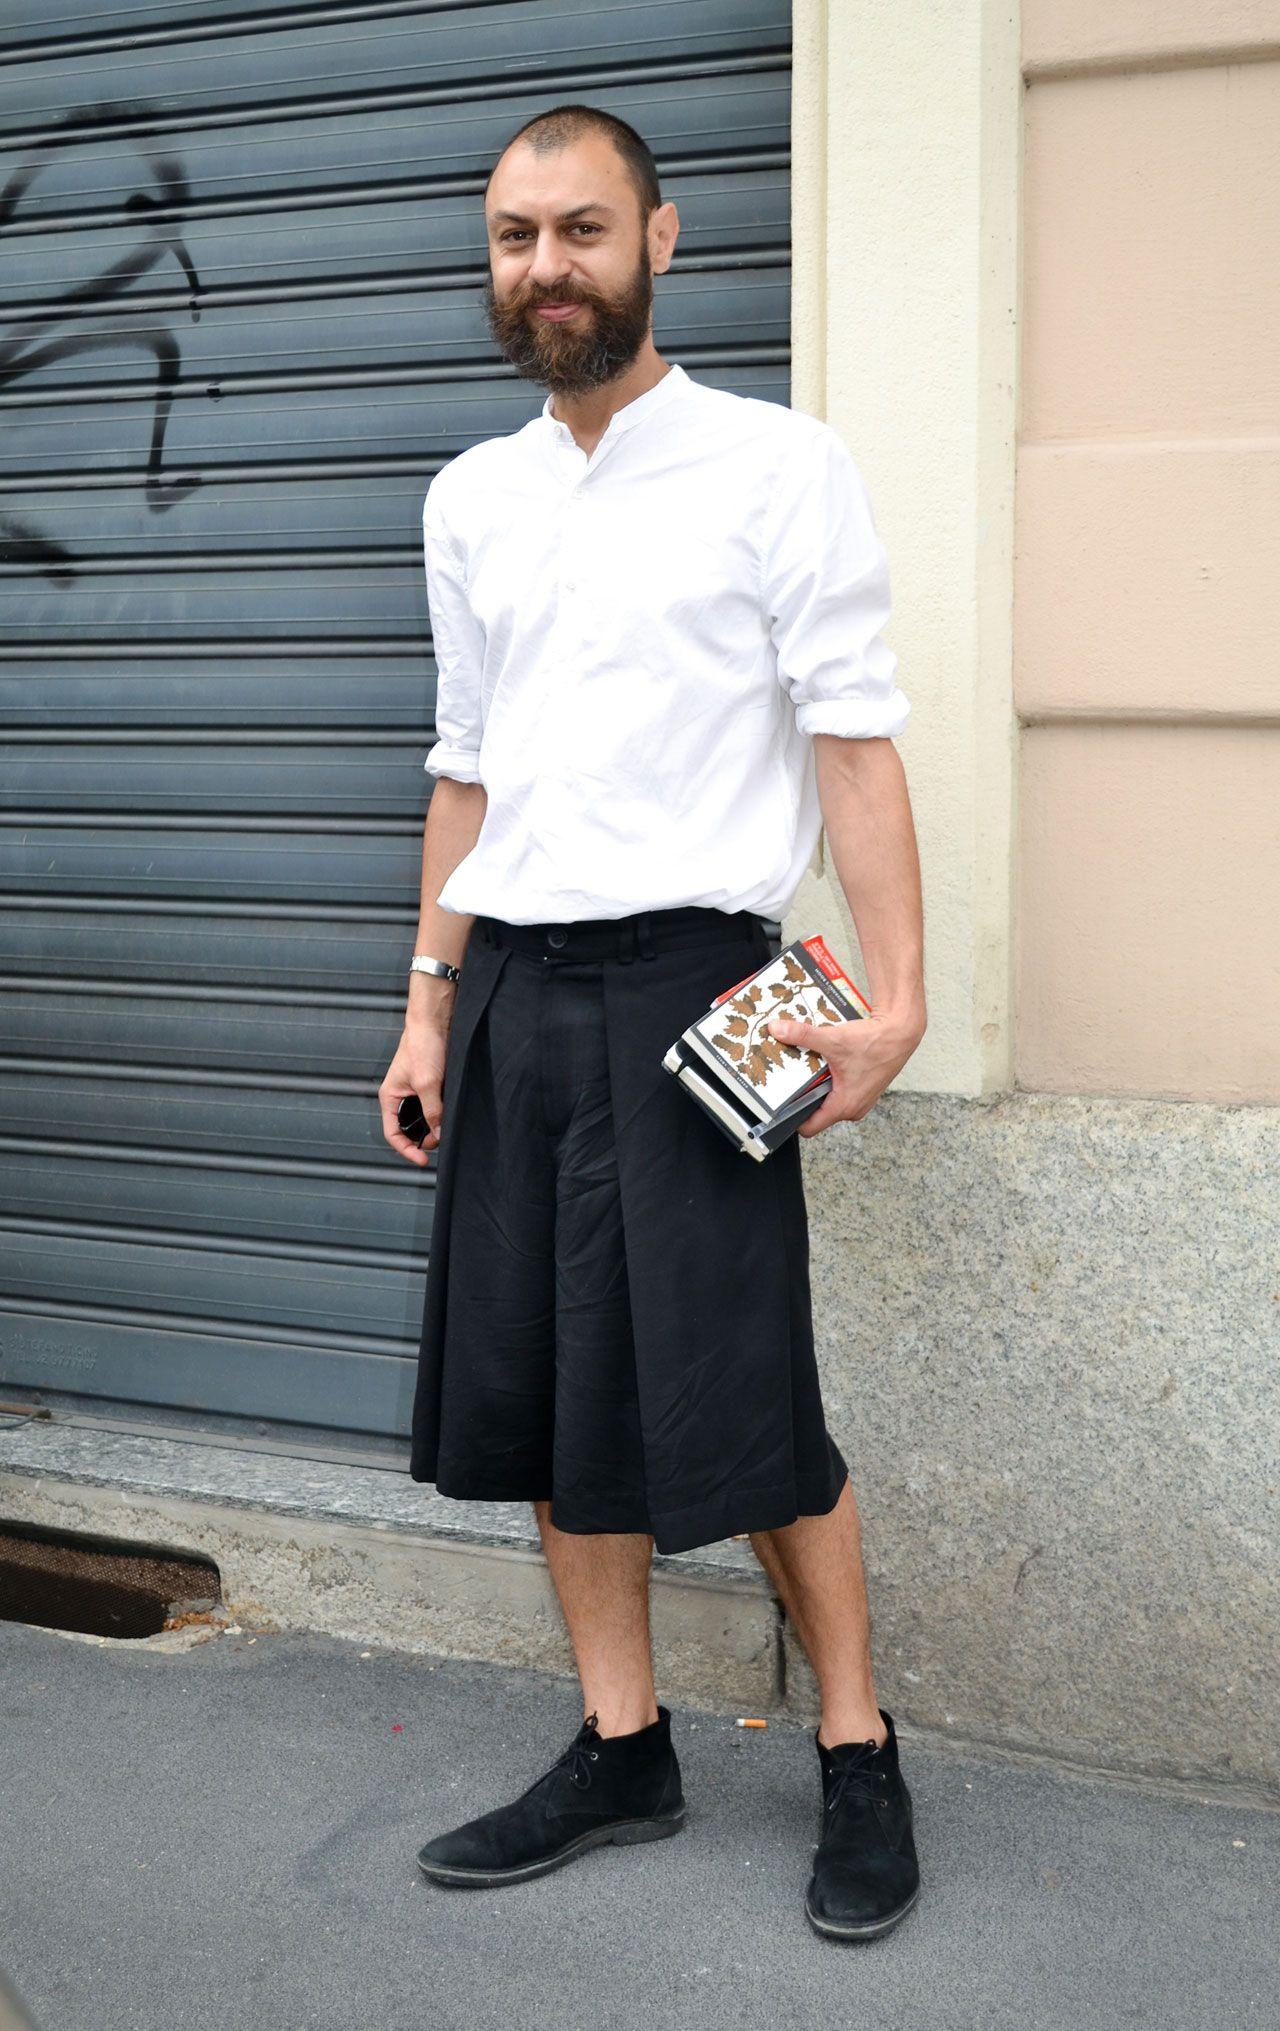 The-Marc-Effect-Men-Kilts-Skirts-Paris-Milan-1241